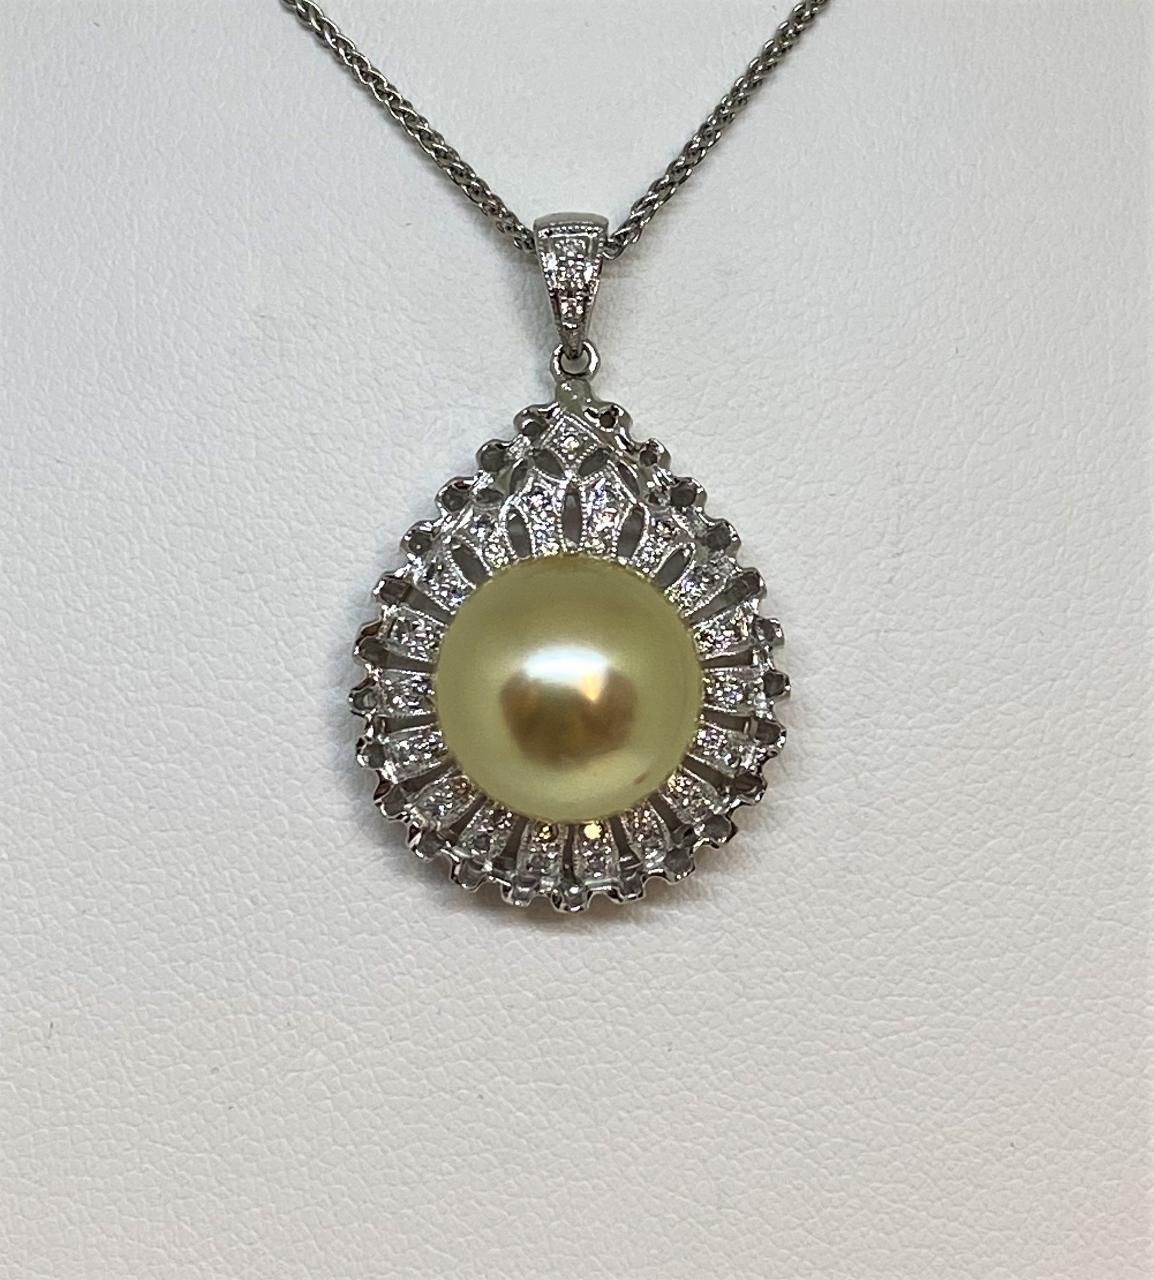 11 Millimeters Golden South Sea Pearl Pendant